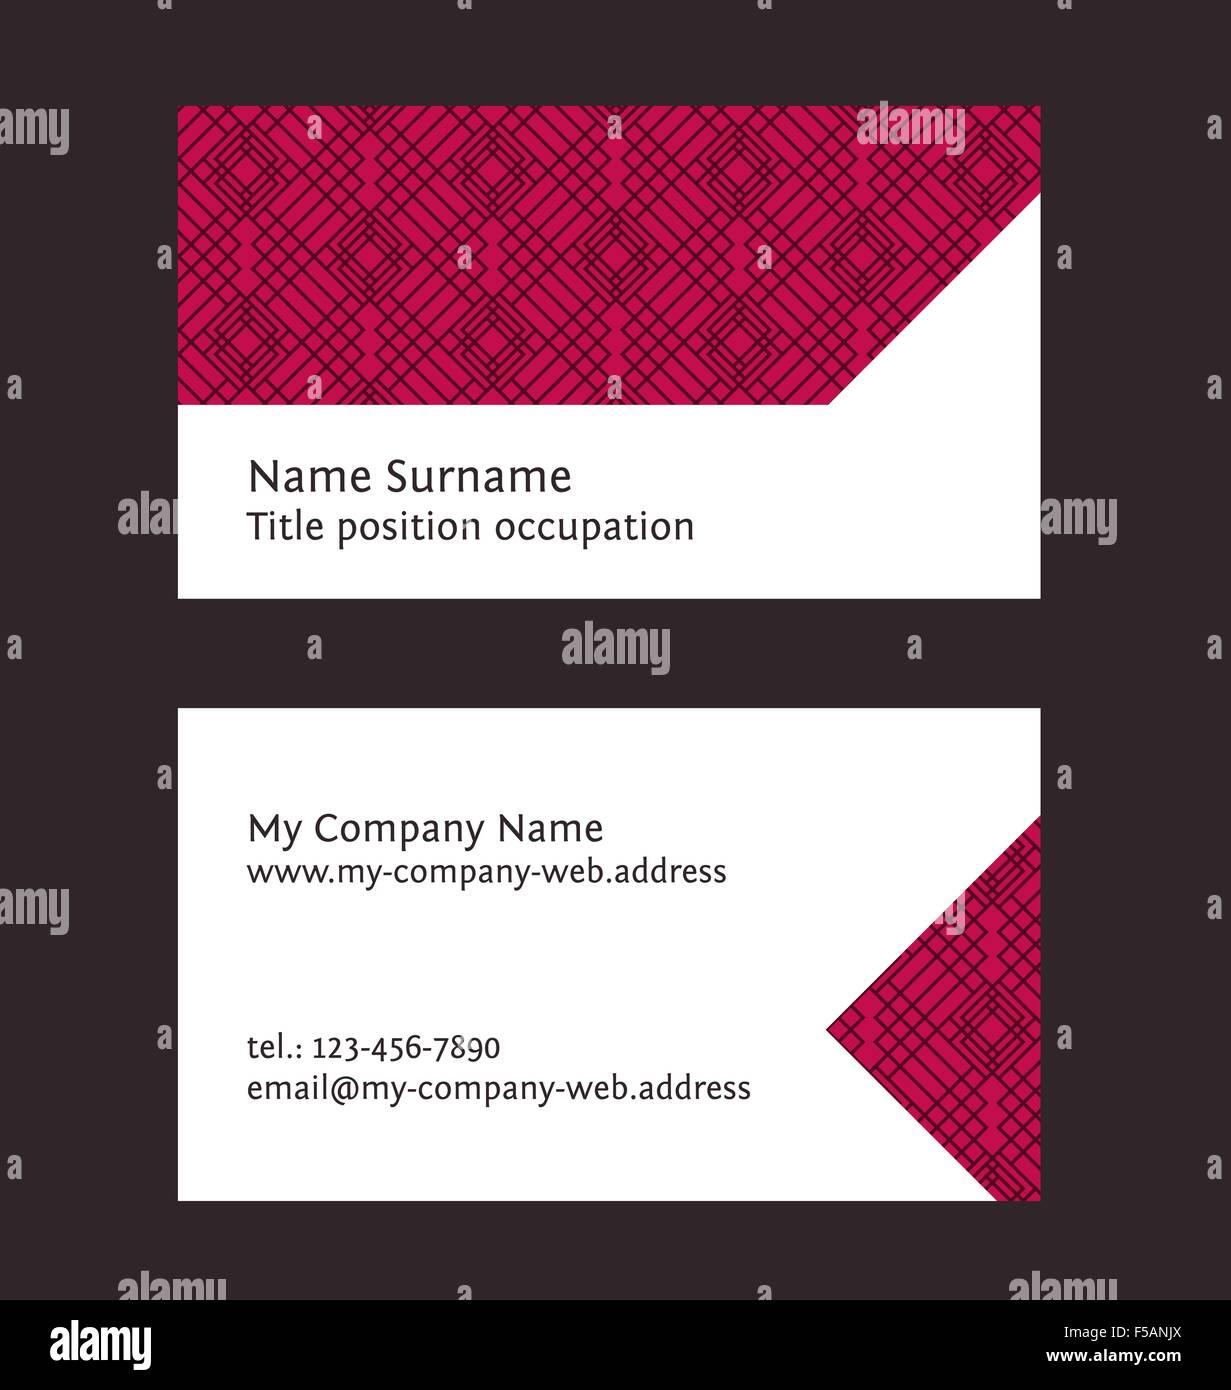 Business card layout linear geometric pattern editable design business card layout linear geometric pattern editable design template friedricerecipe Gallery